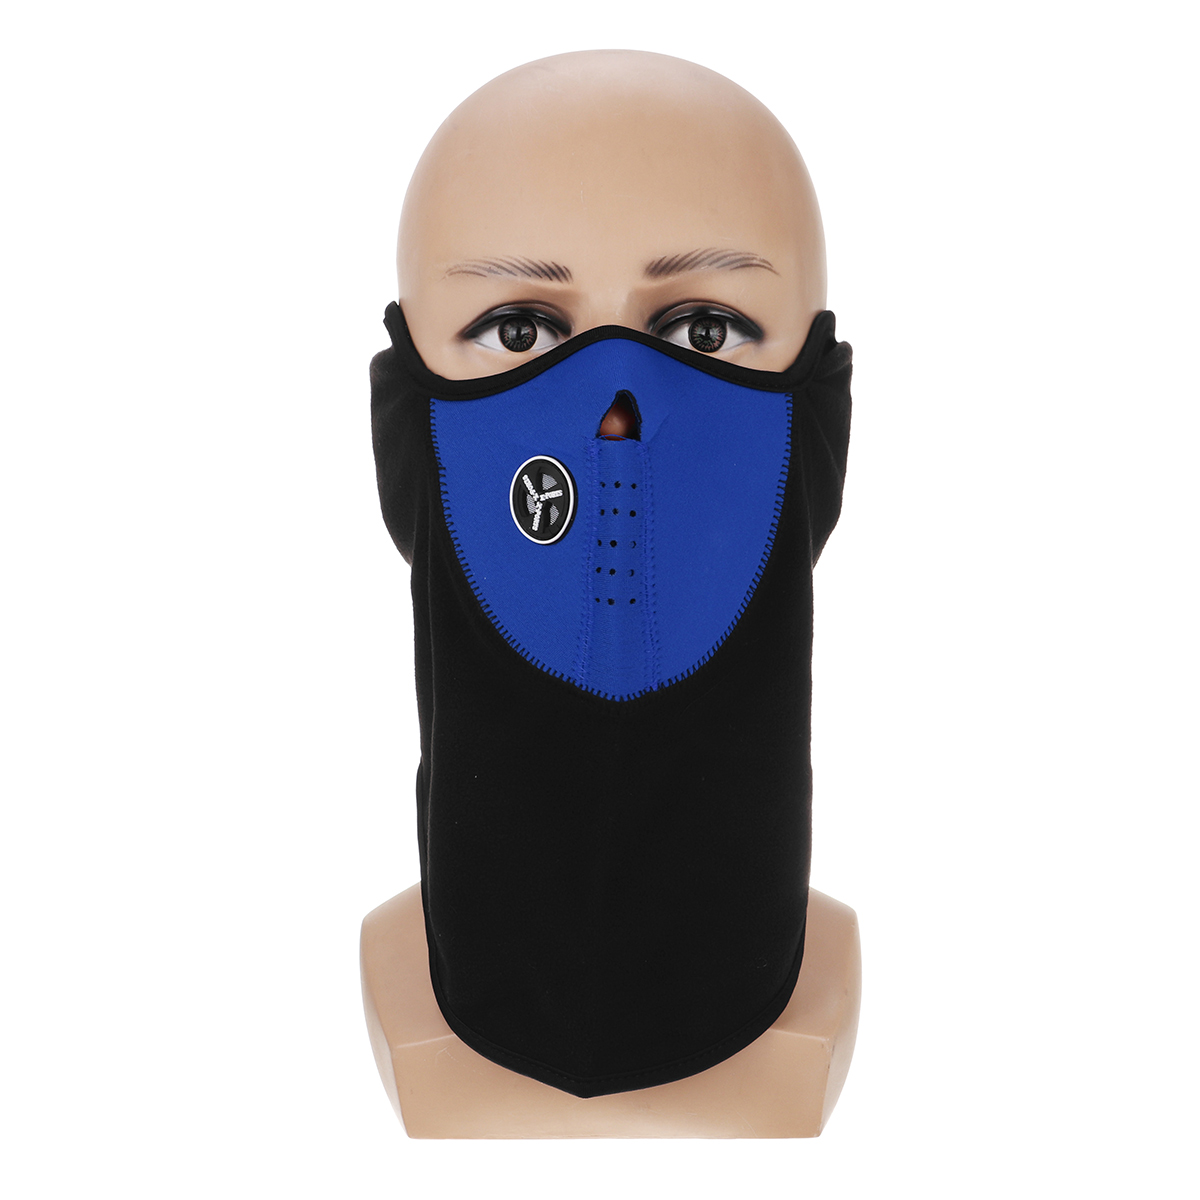 Face Mask Windproof Dustproof Outdoor Warm Motorcycle Riding Mountain Climbing Ski